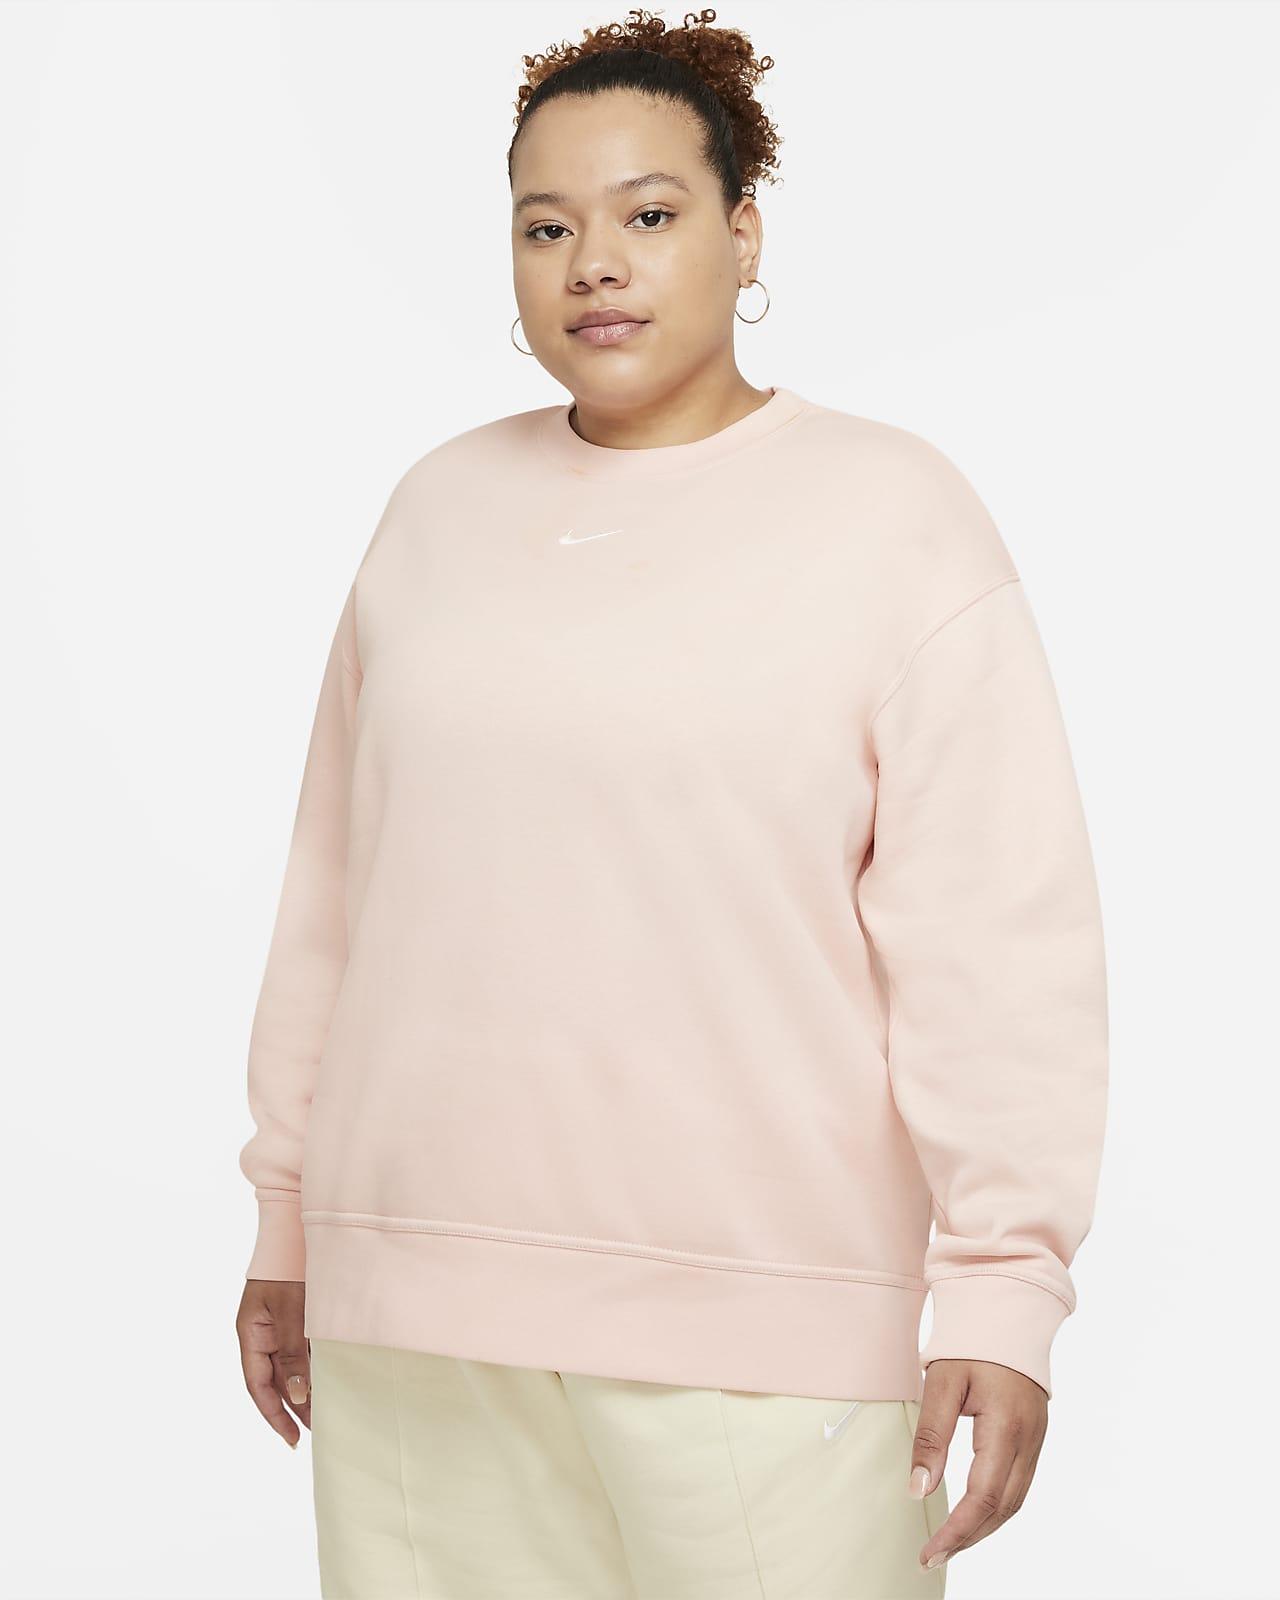 Nike Sportswear Collection Essentials Women's Fleece Crew (Plus Size)